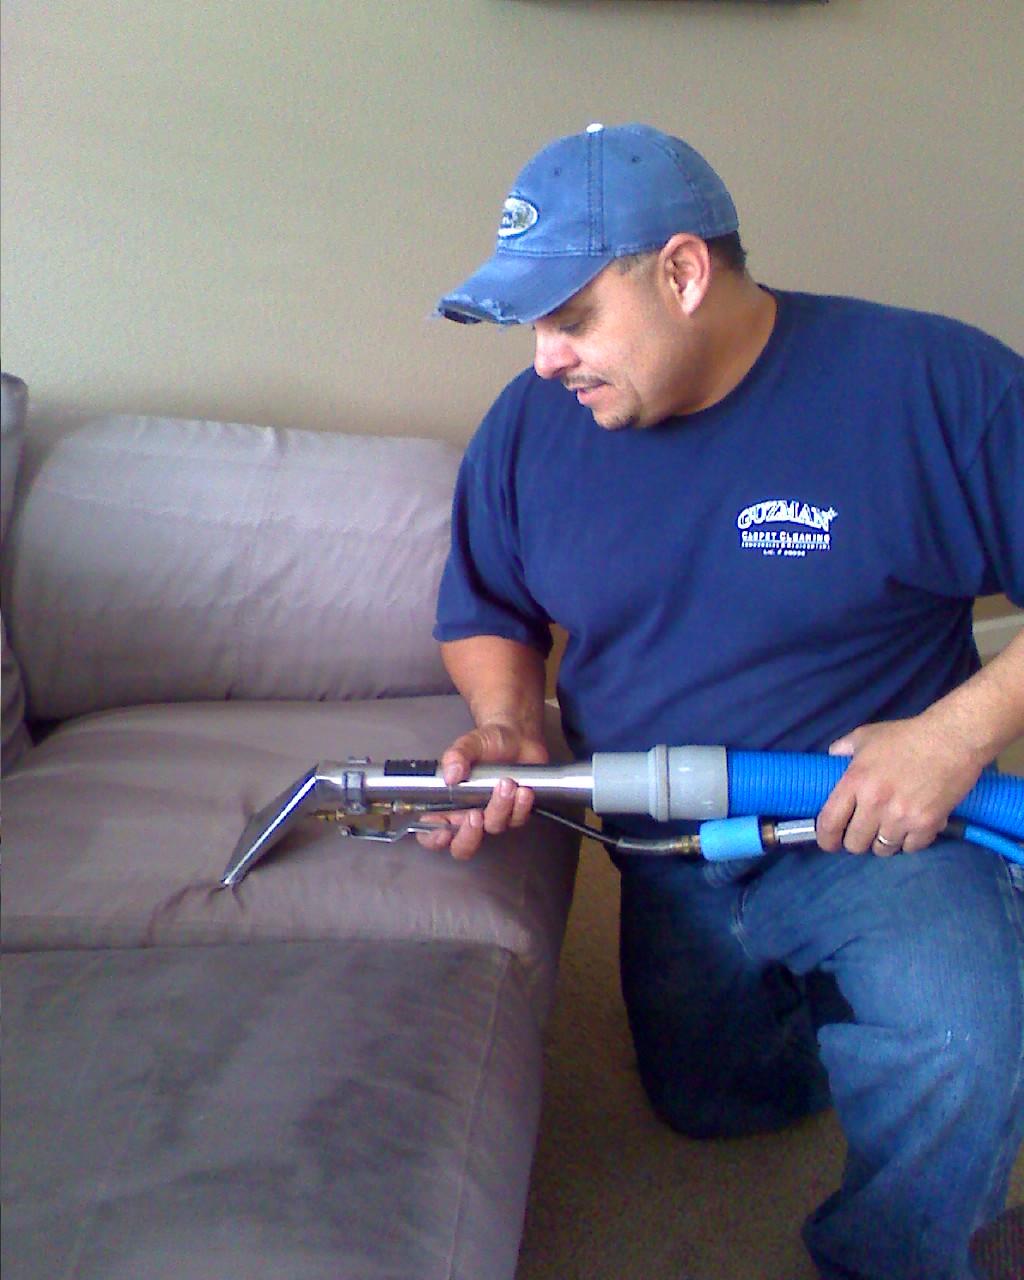 Guzman Carpet Cleaning